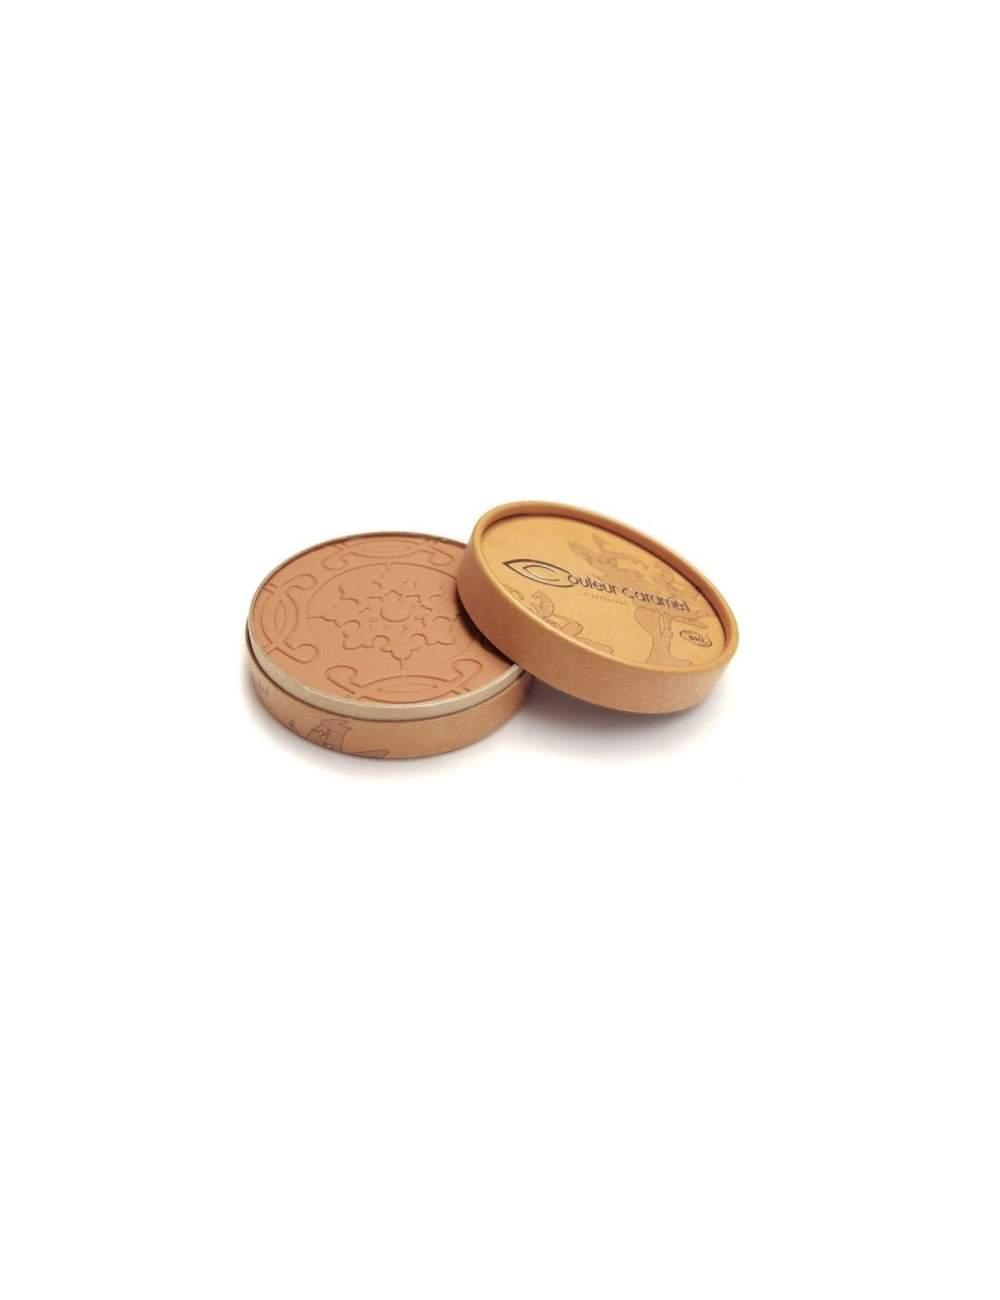 Poudres Bronzantes Bio Mates Terre Caramel 26 Beige Brown. Couleur Caramel